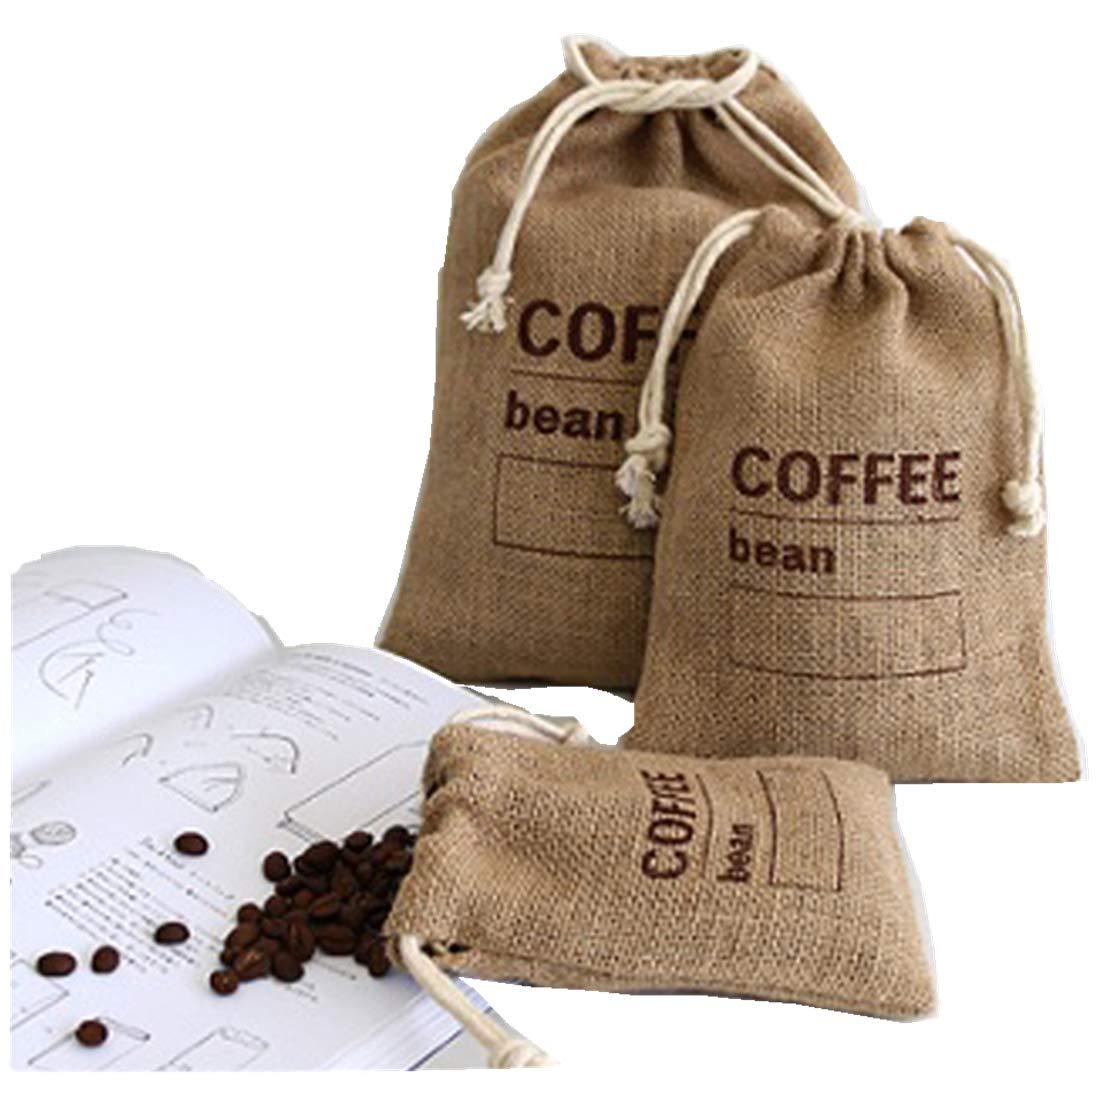 "Cereals Jute Woven Bundles Coffee Bean Bags Kitchen Sundries Peas Bags Sacks Date Record Natural Burlap Bags Drawstring Reusable (3, 11.8"" X 7.87"")"